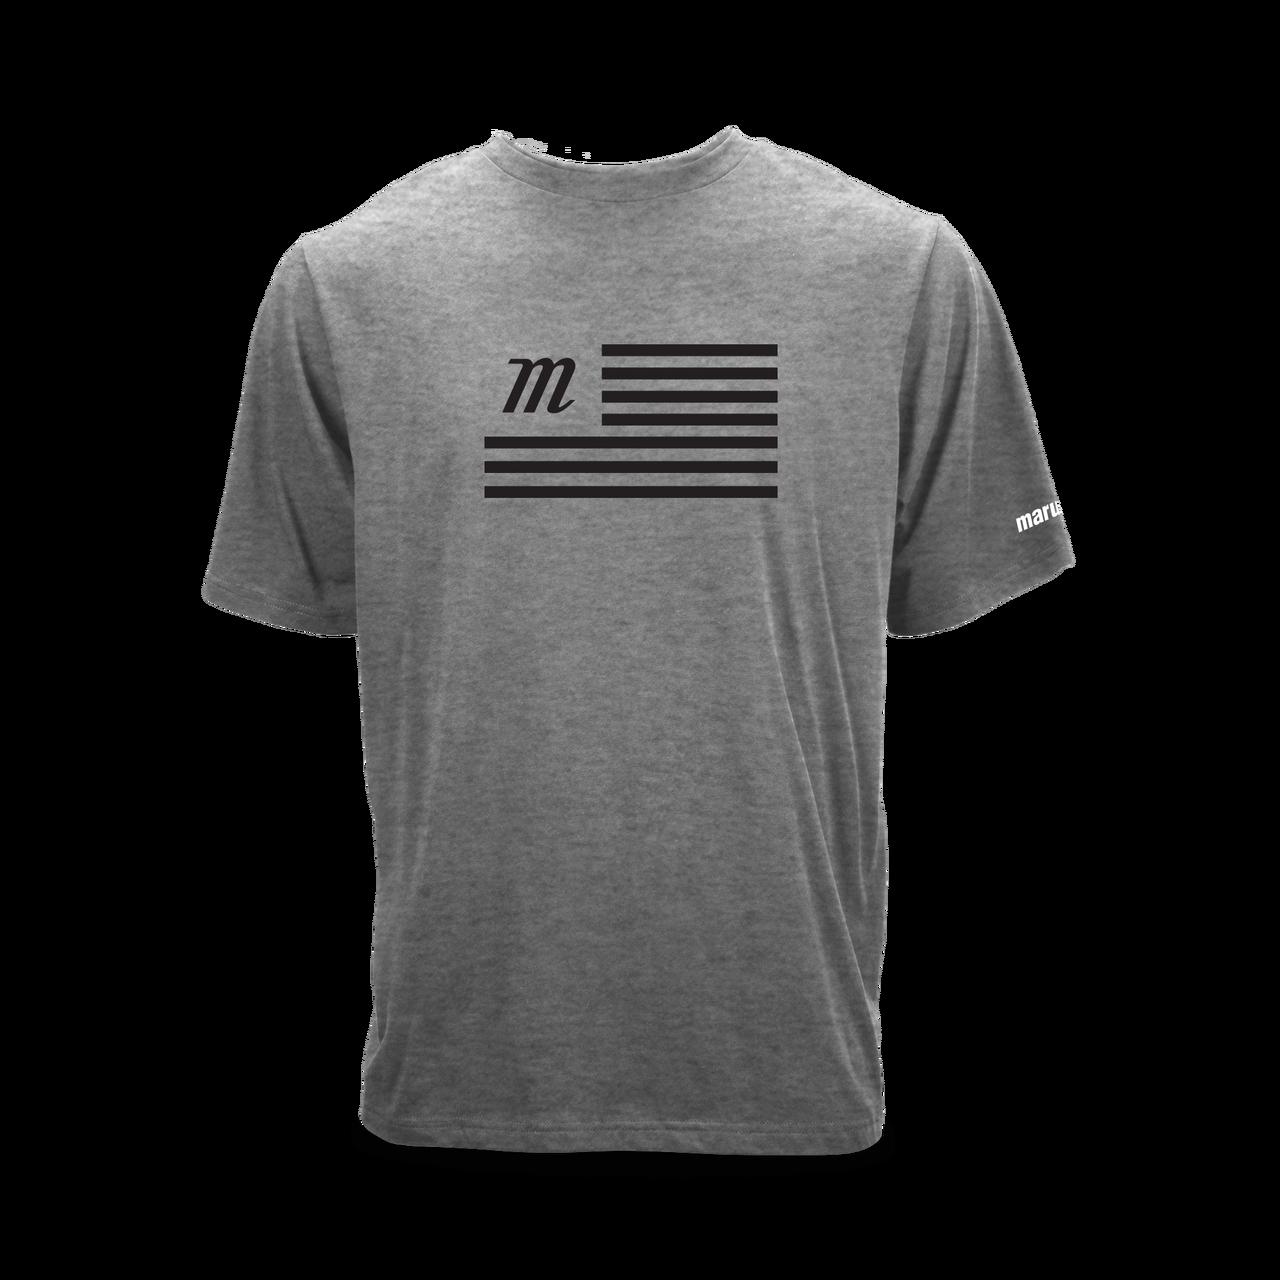 Youth Marucci Flag T Shirt